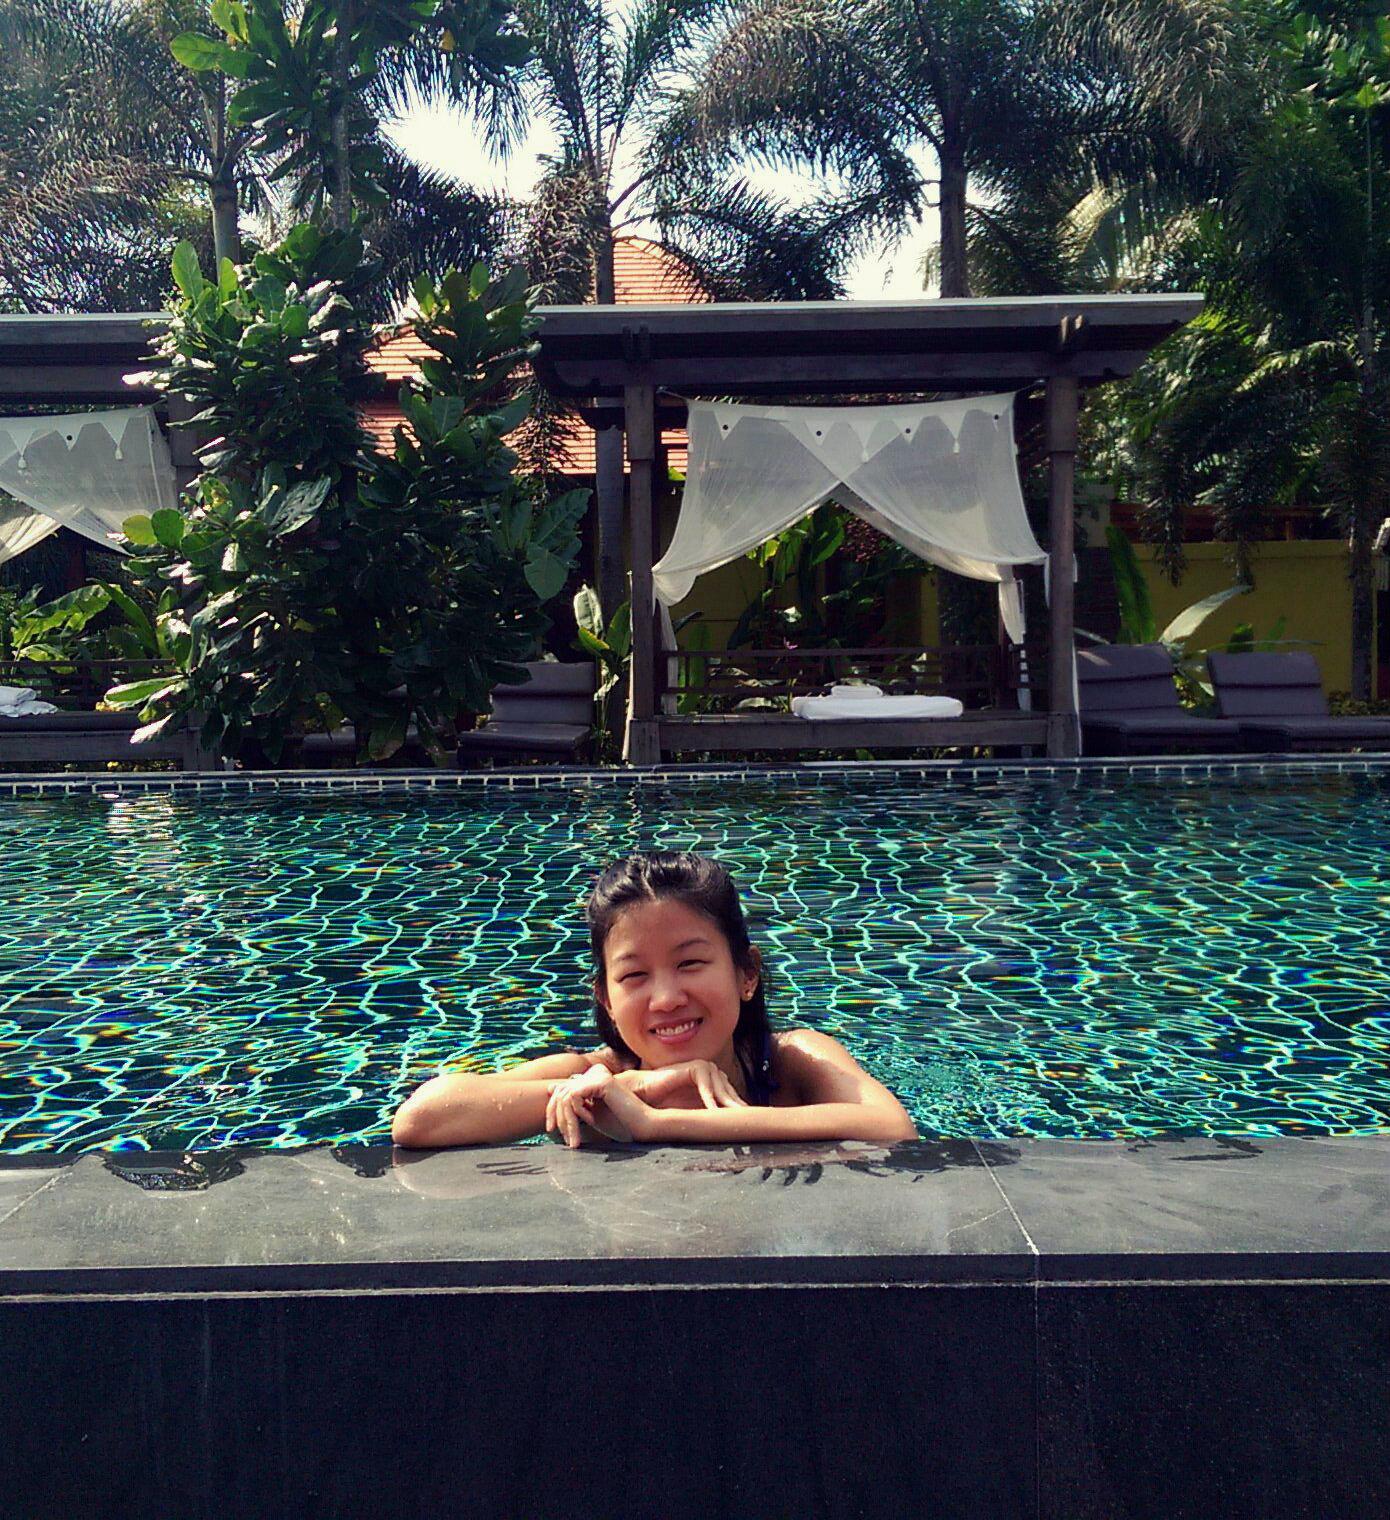 yiweilim, yi wei lim, yiwei lim, yi wei lim blogspot, khao lak, phuket, bang niang beach, bang niang, phangnga, chongfah resort, chongfah boutique hotel, chongfah khao lak, swimming